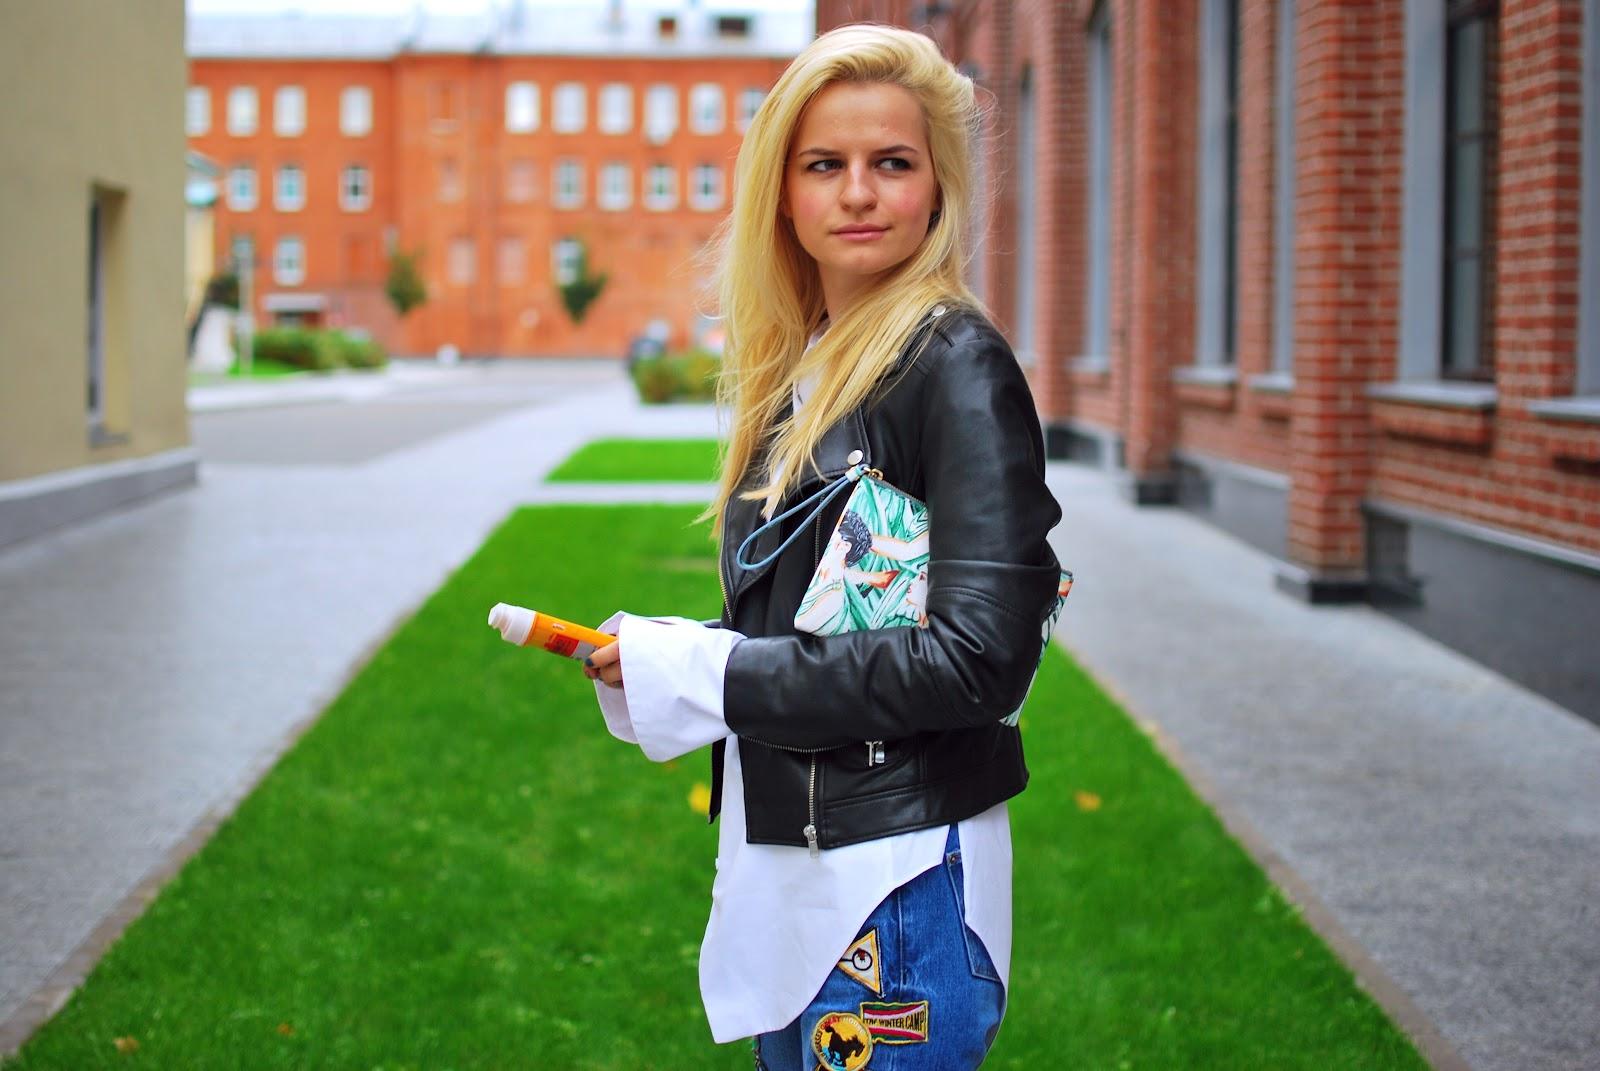 блоггер, фэшн блоггер, уличная мода, уличная мода осень, street style moscow, street style blogger